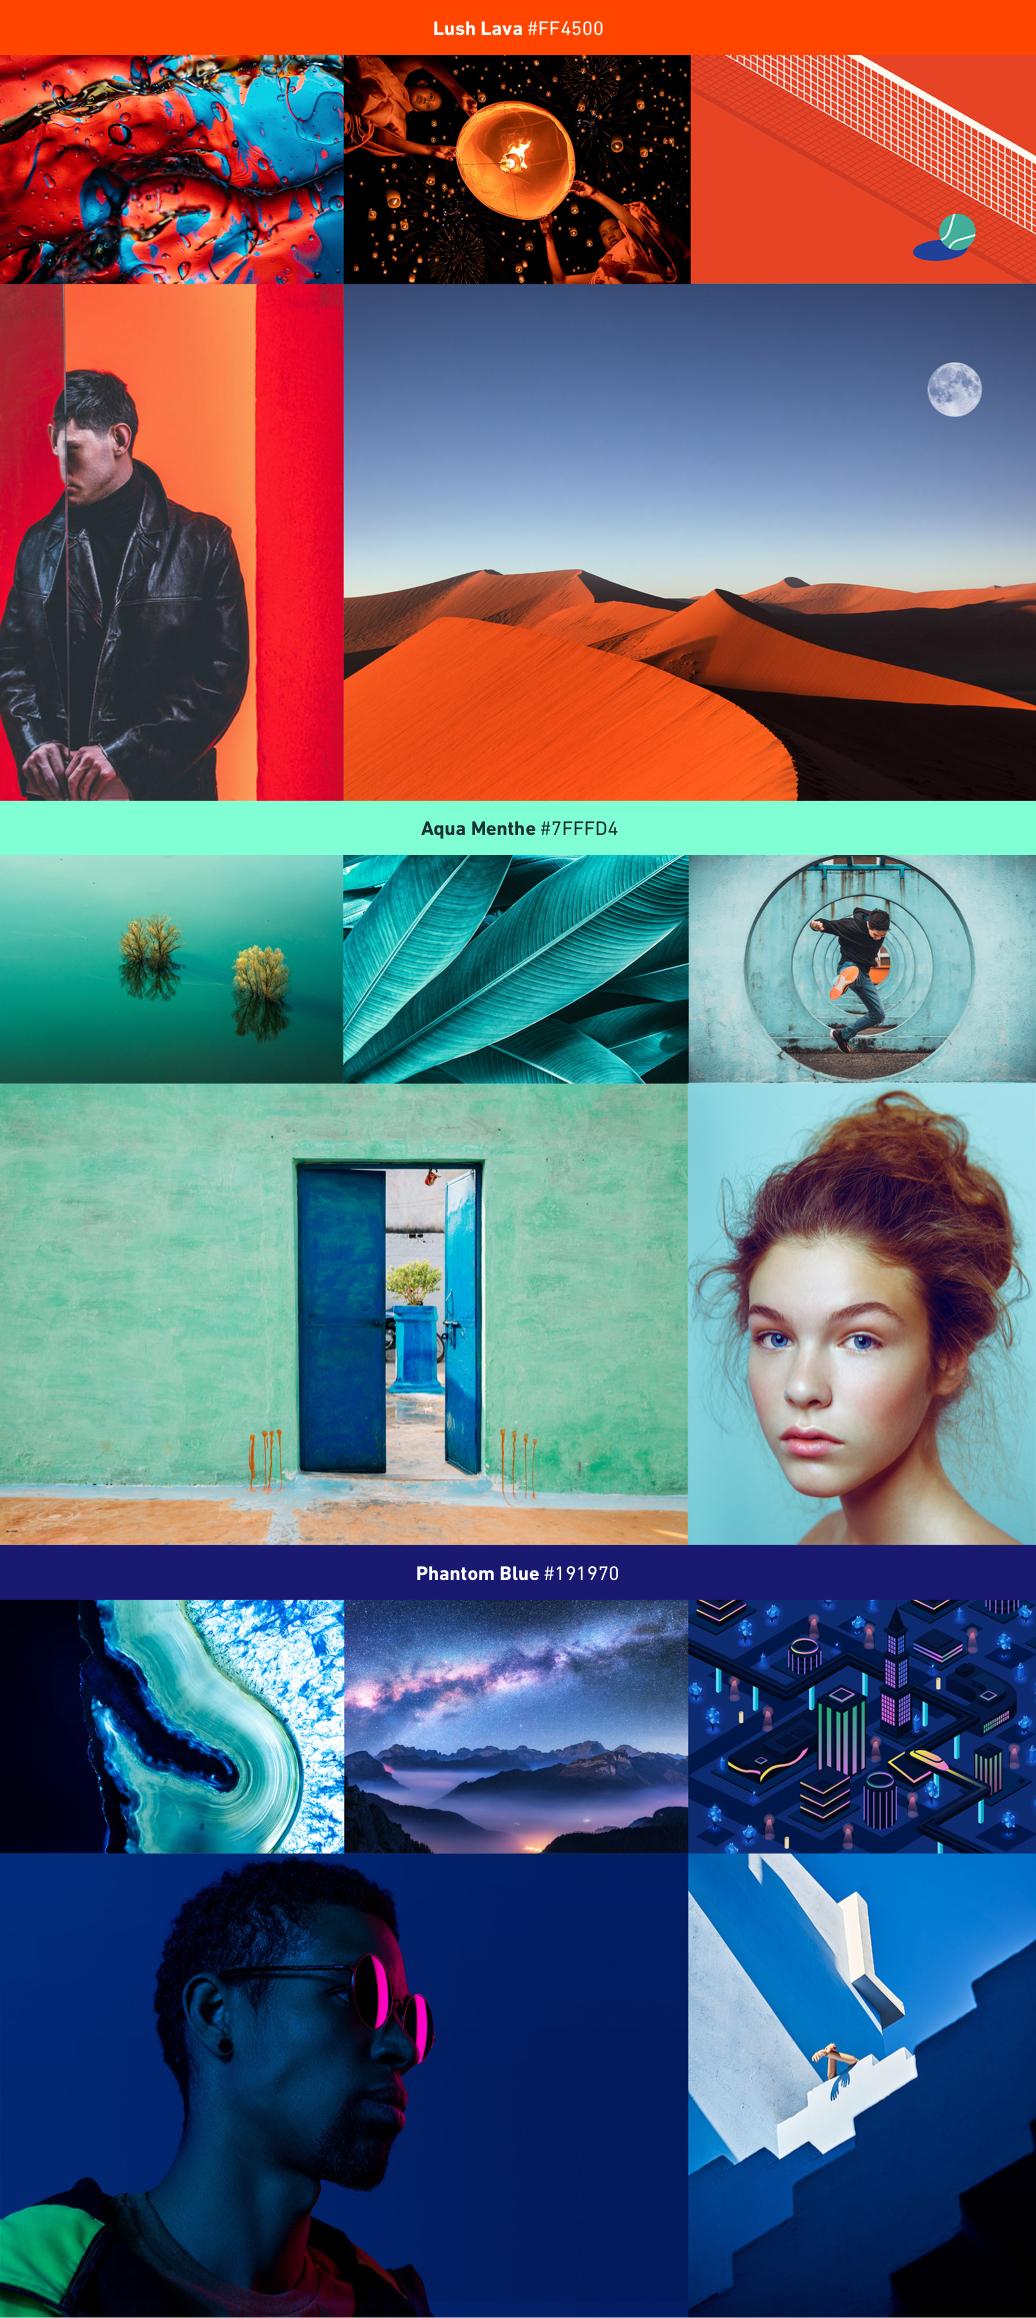 Shutterstock's 2020 Color Trends